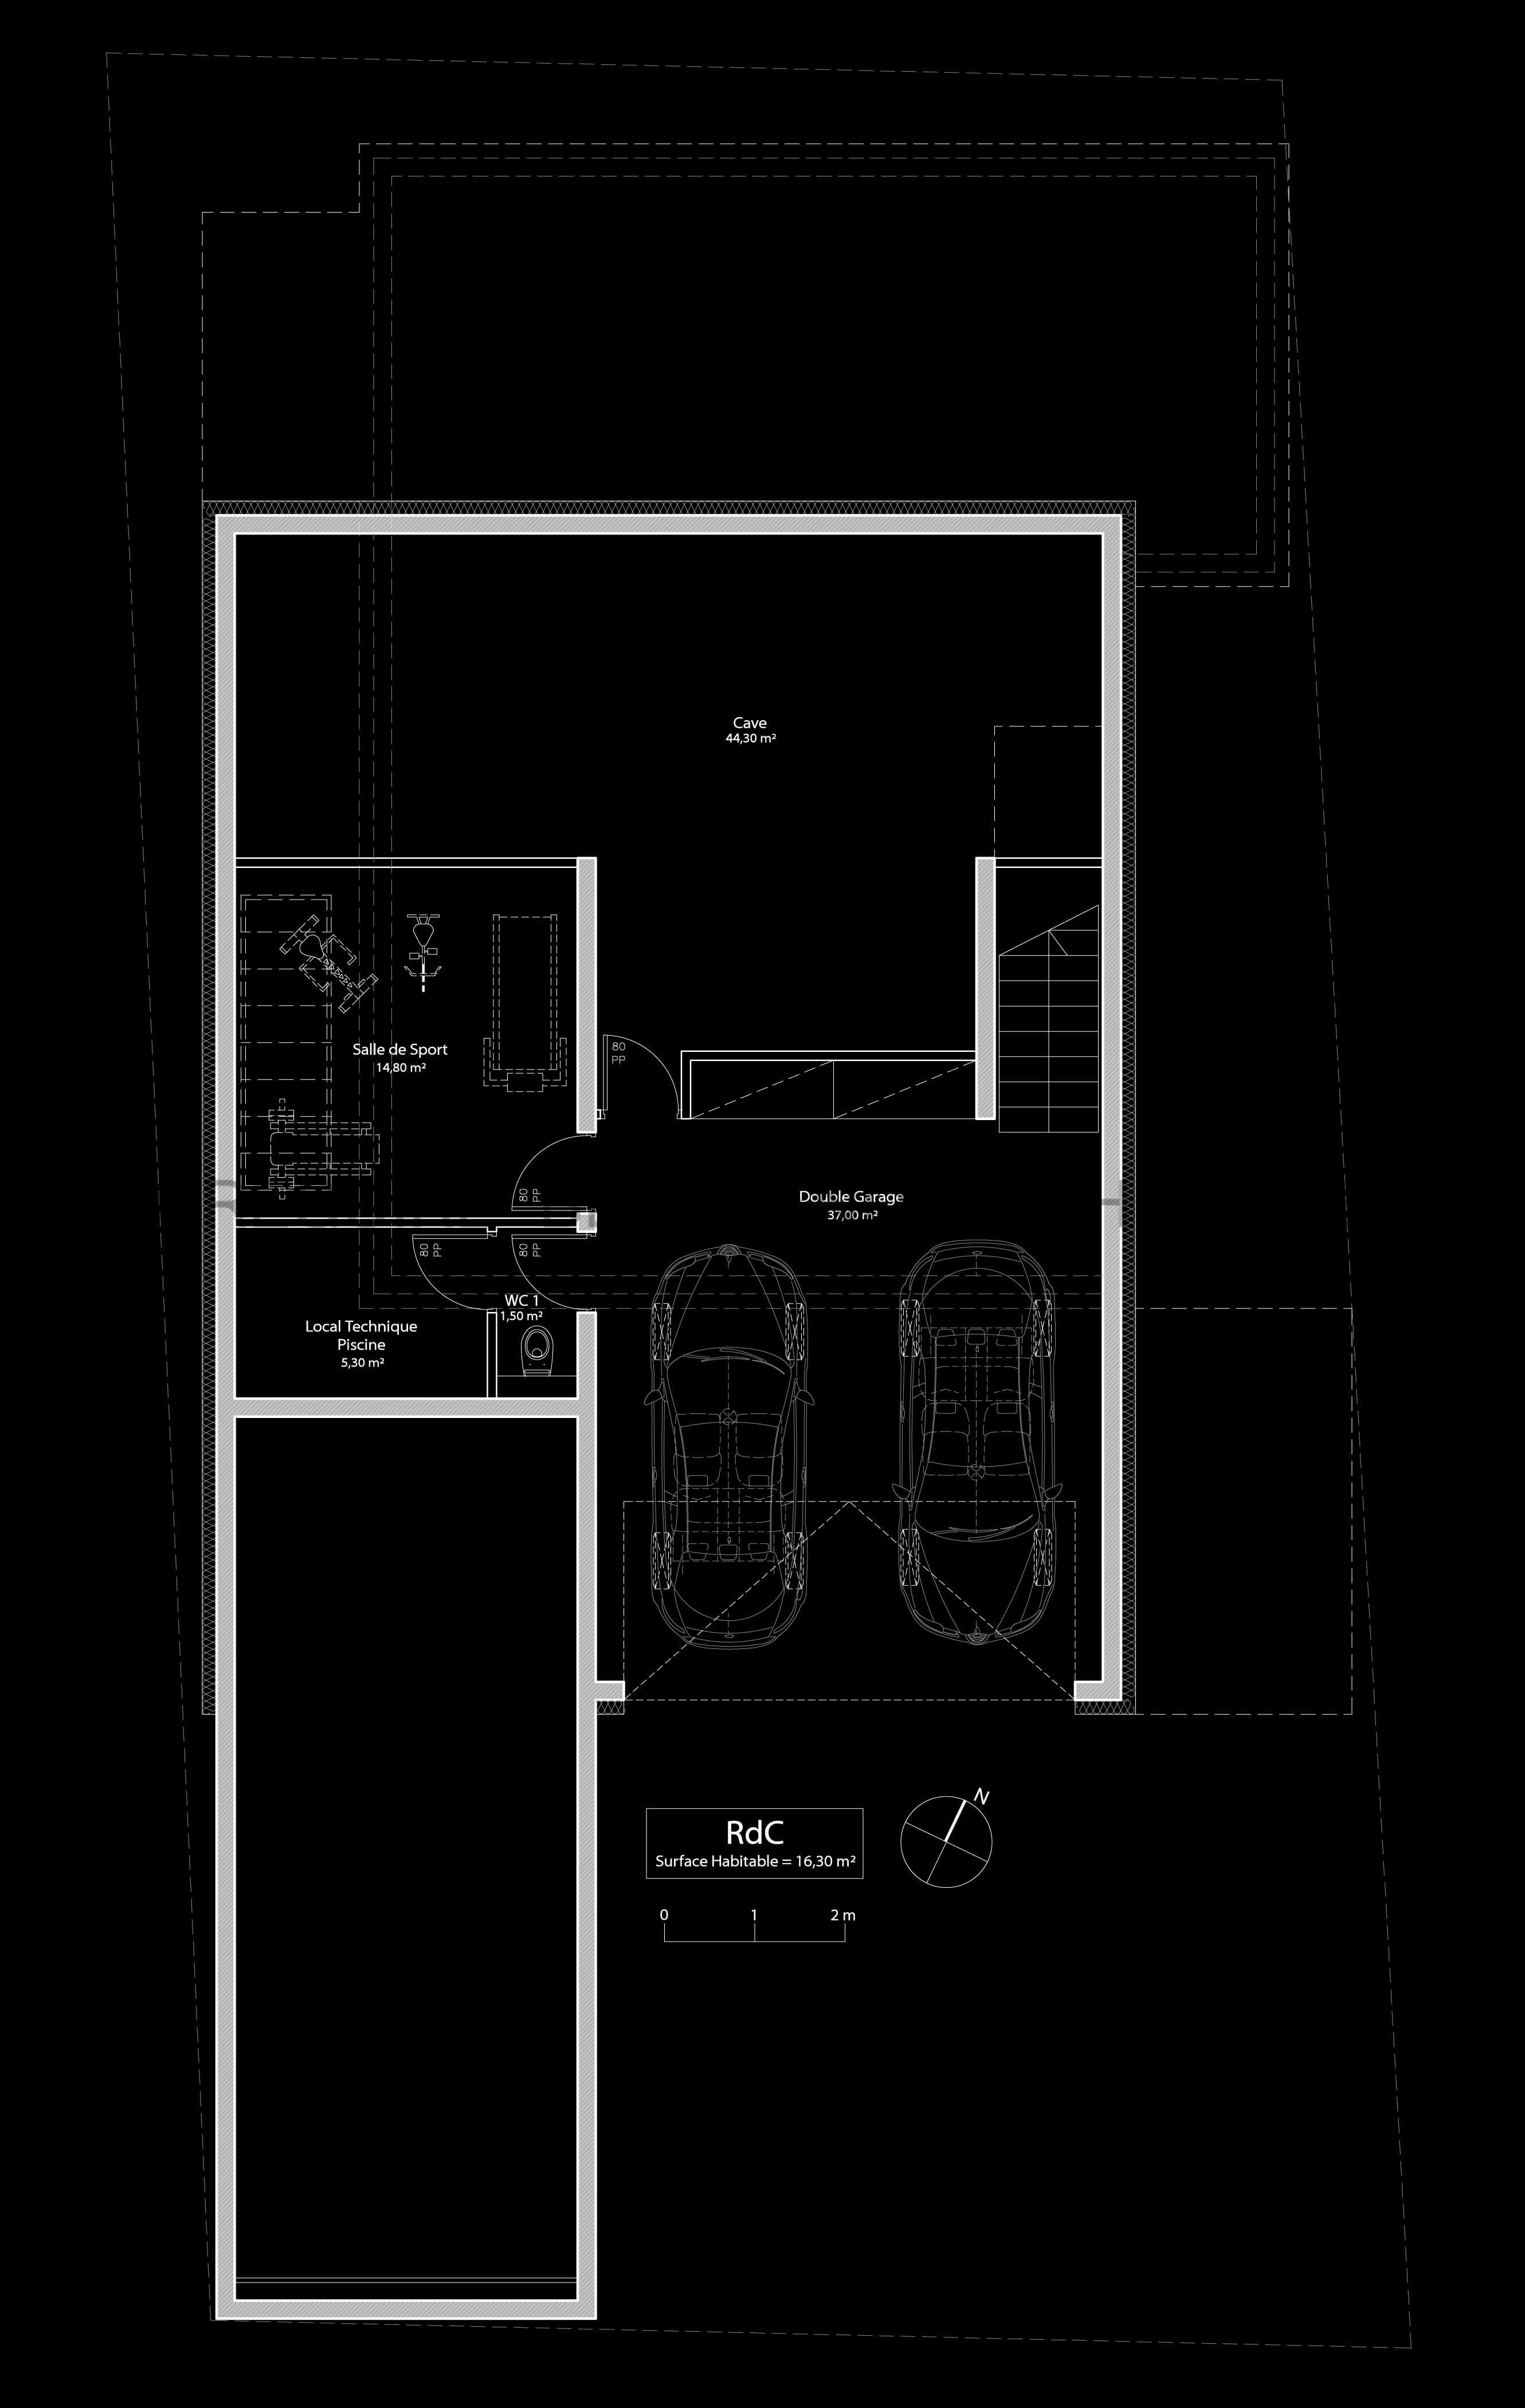 2017 01 28 (2015-010) 008 - Plans - RdC